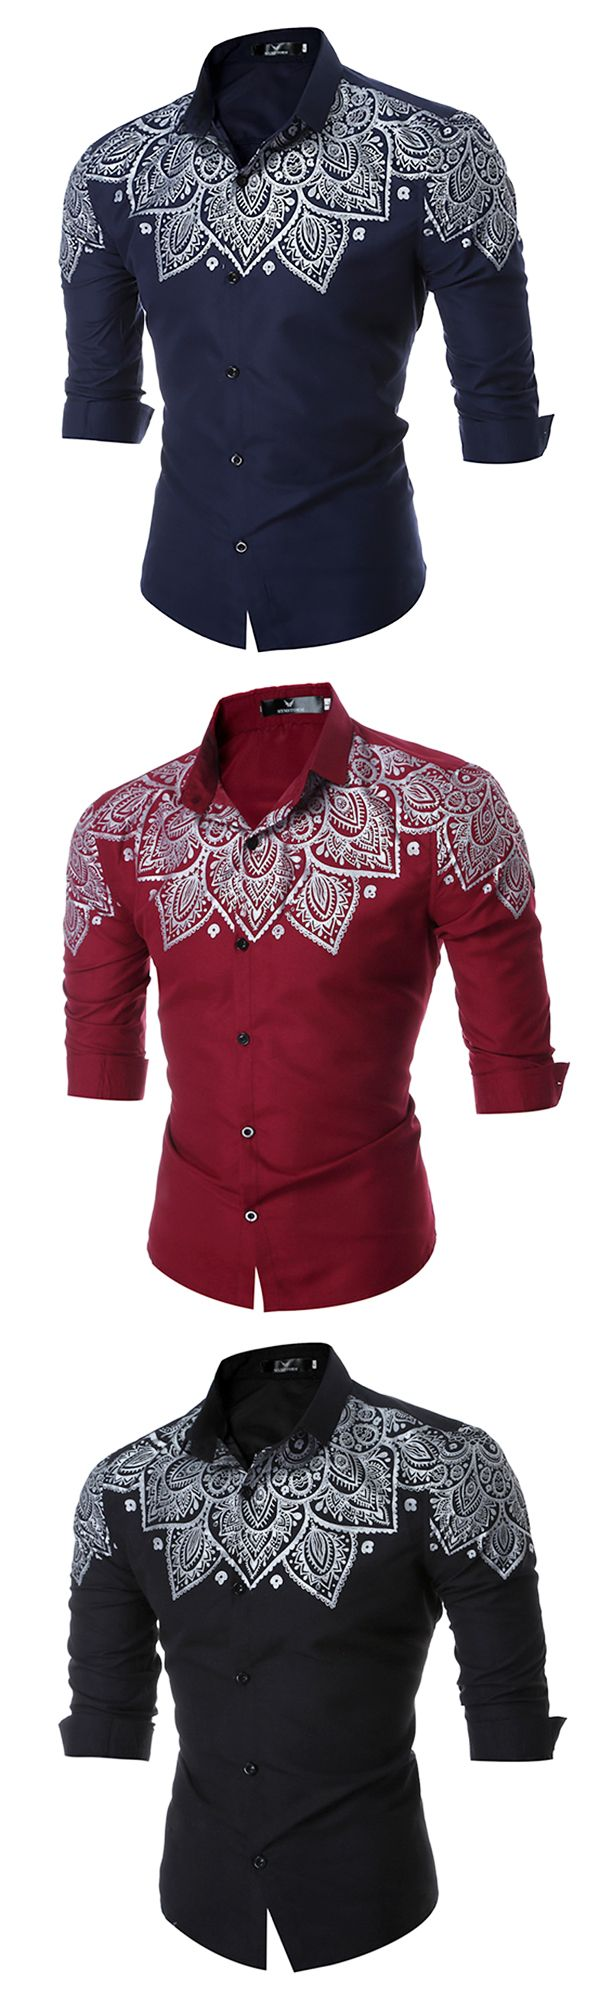 Casual Slim Fit Printing Shirt for Men: Long Sleeve / Turn Down Cololar Dress